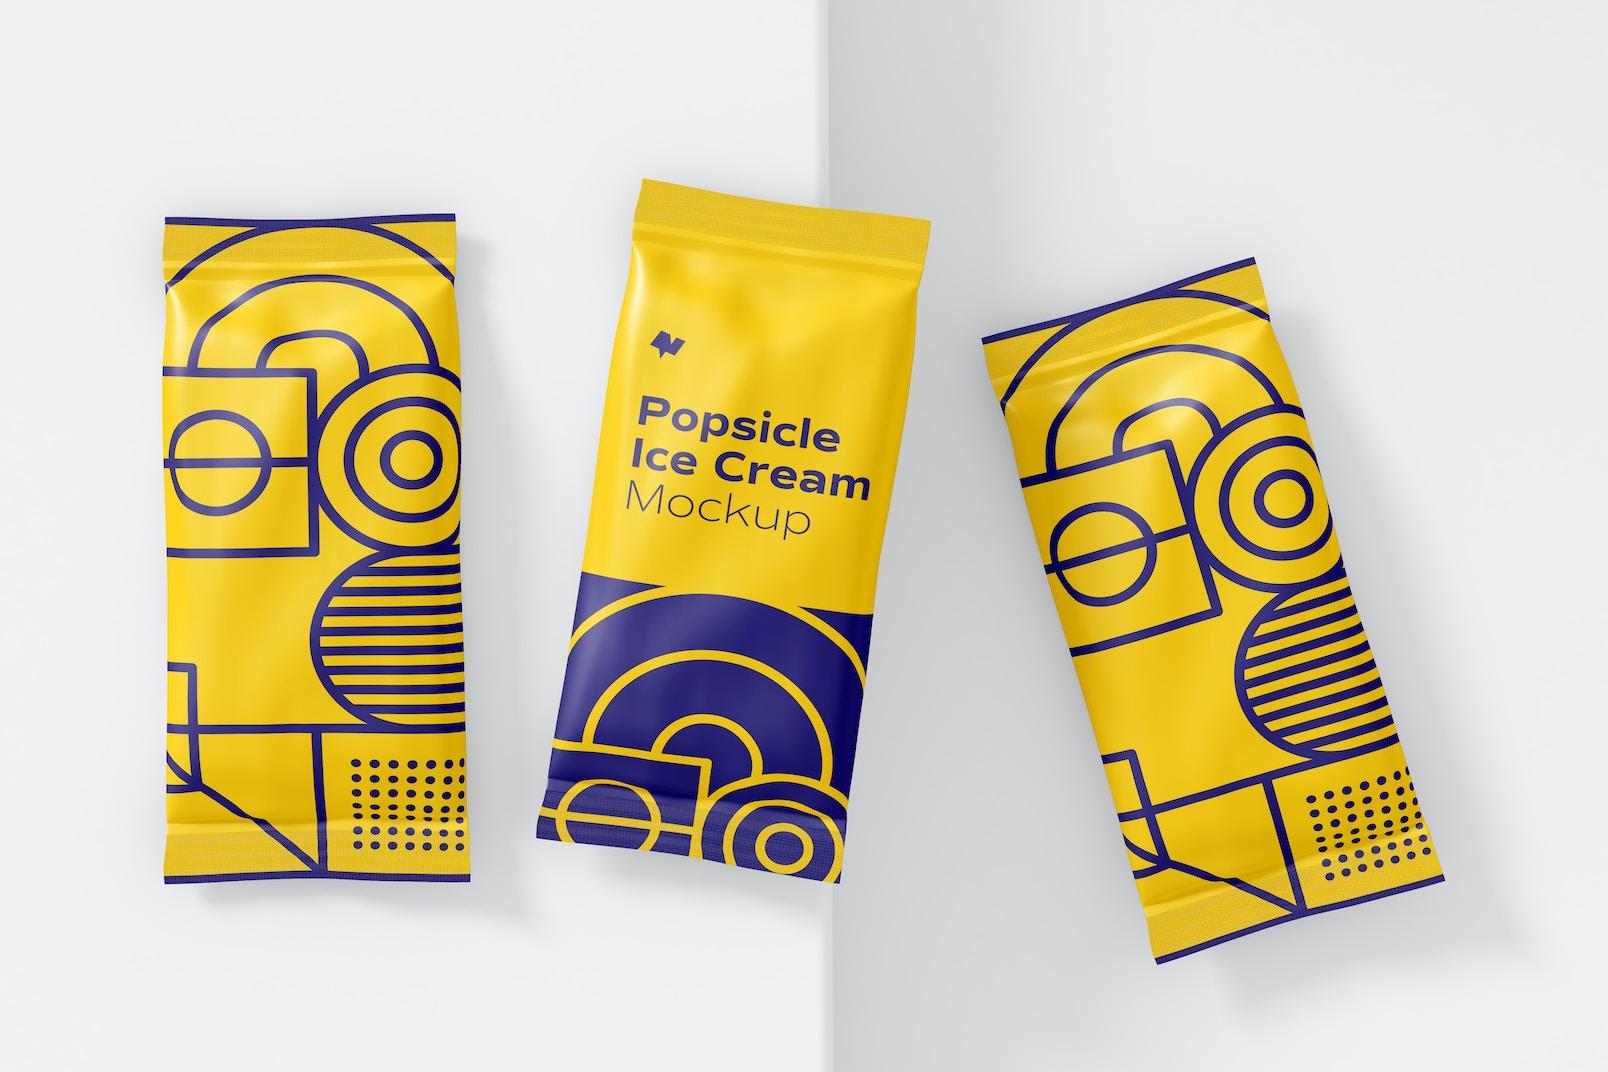 Popsicle Ice Cream Packaging Mockup